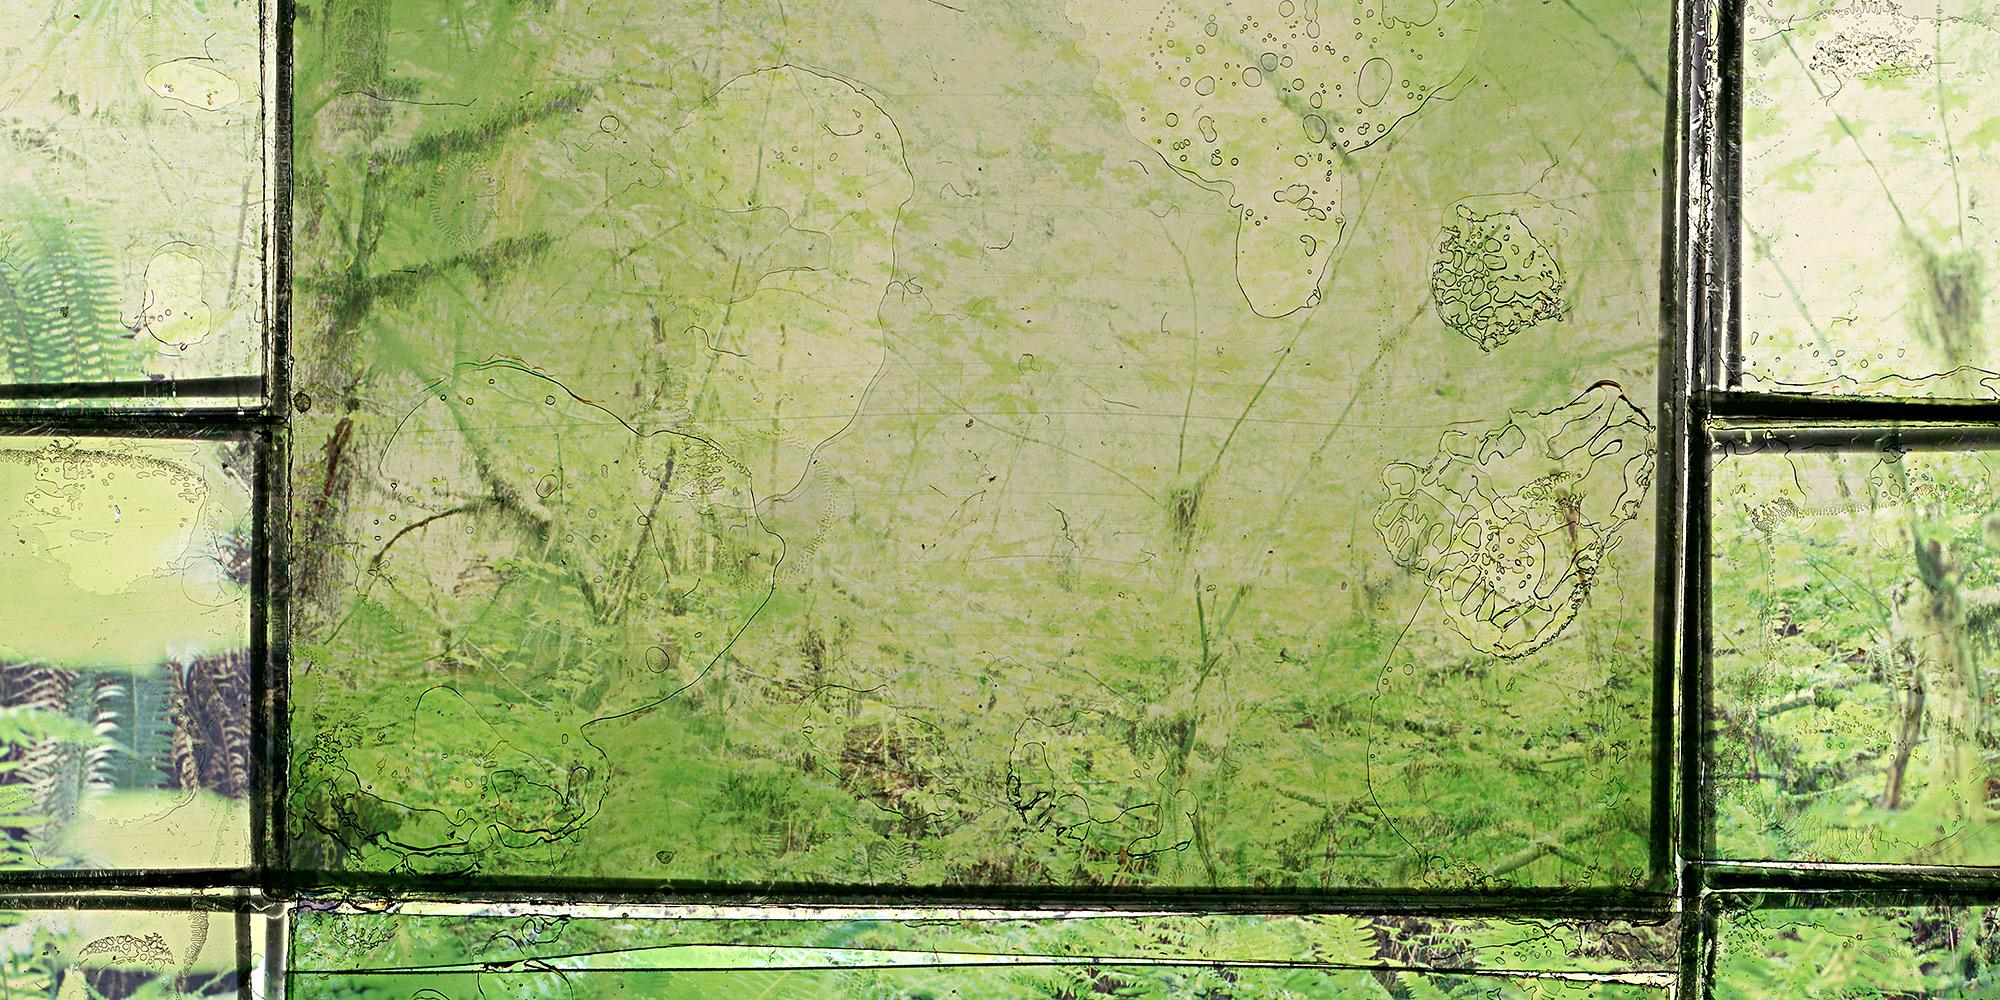 Website-Photos-April-2018_0003_Rainforest-1-detail-.jpg